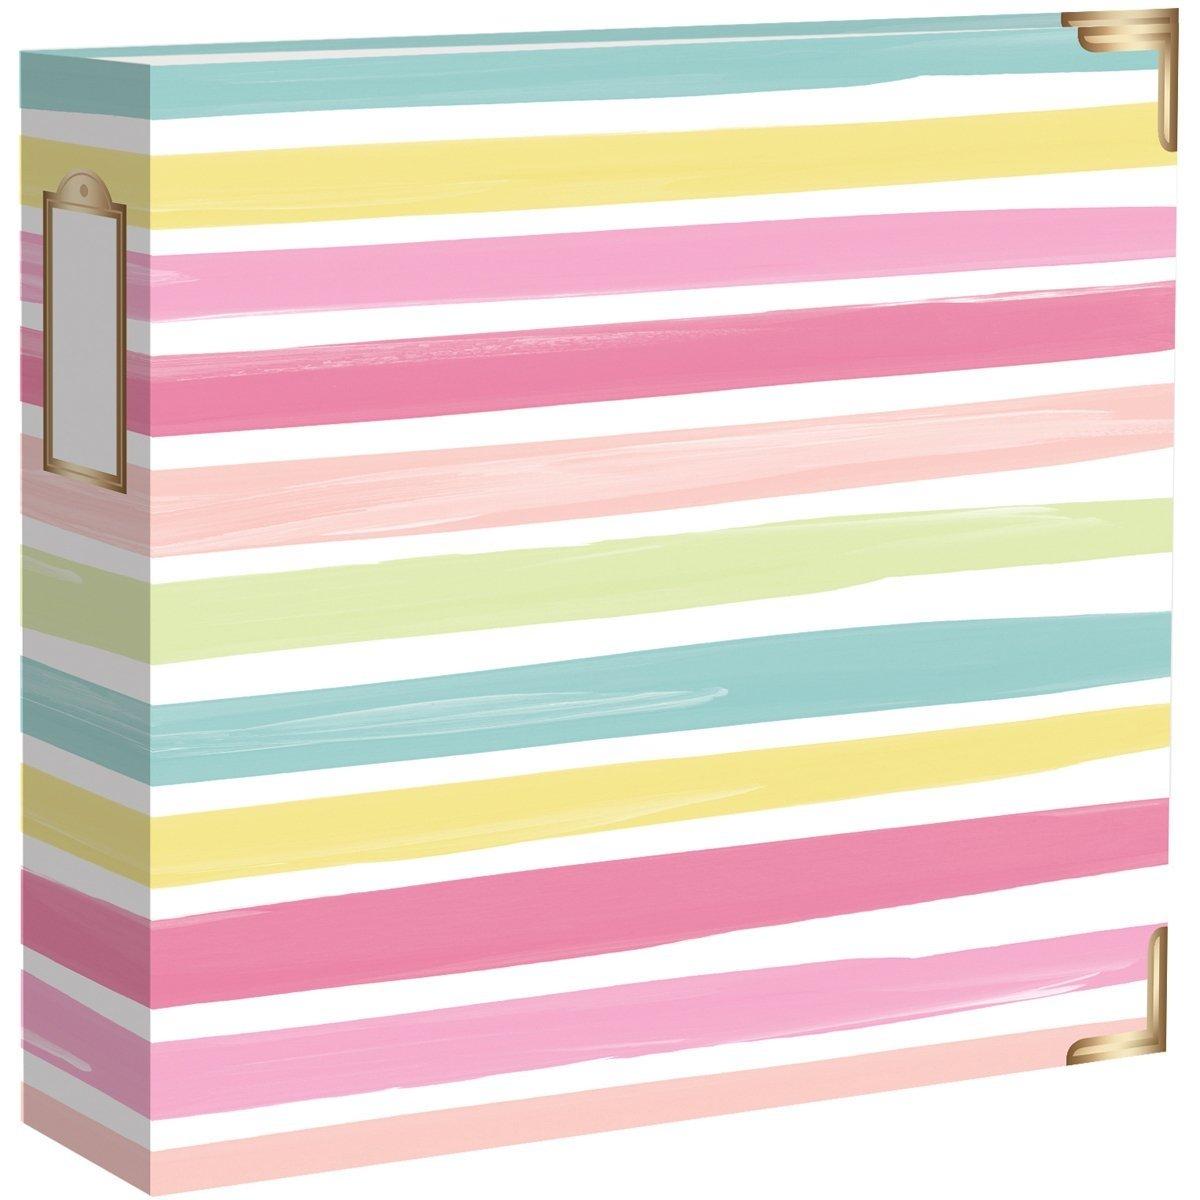 American Crafts Becky Higgins Project Life 12'' x 12'' D-Ring Scrapbook Album - Pastel Stripes